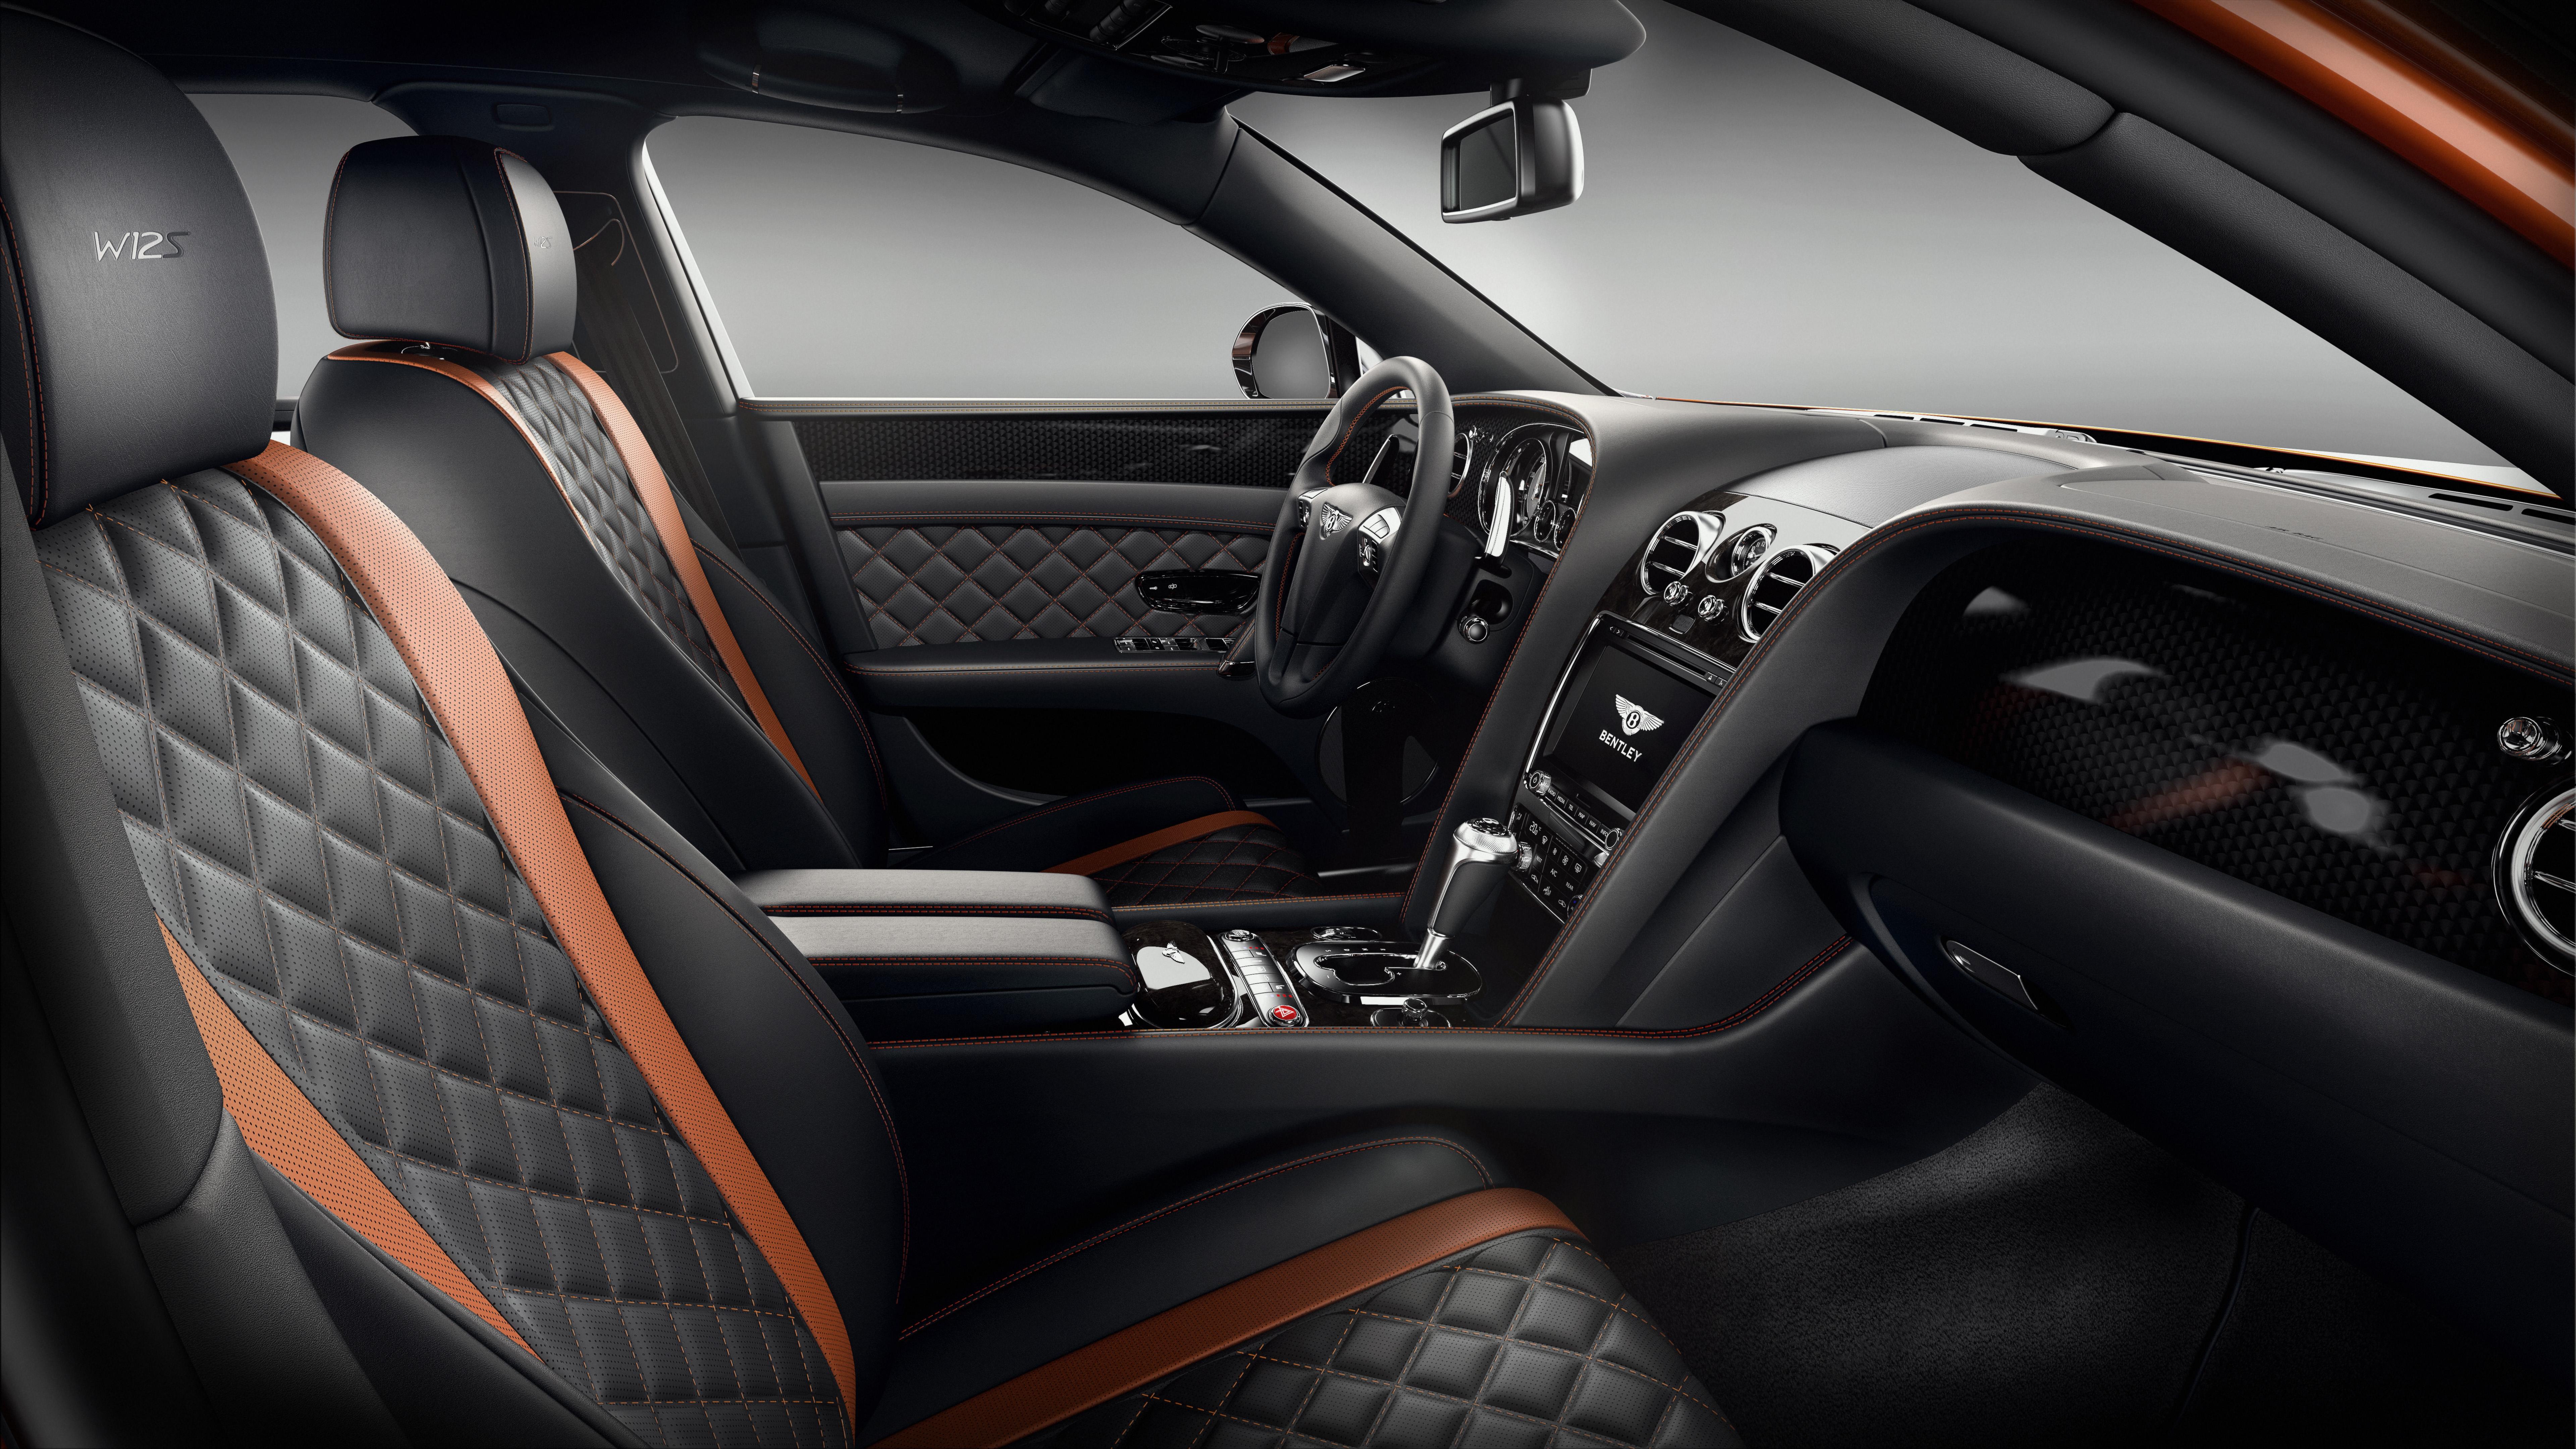 Audi S7 Coupe 100 S comparison 285 960x480 photo